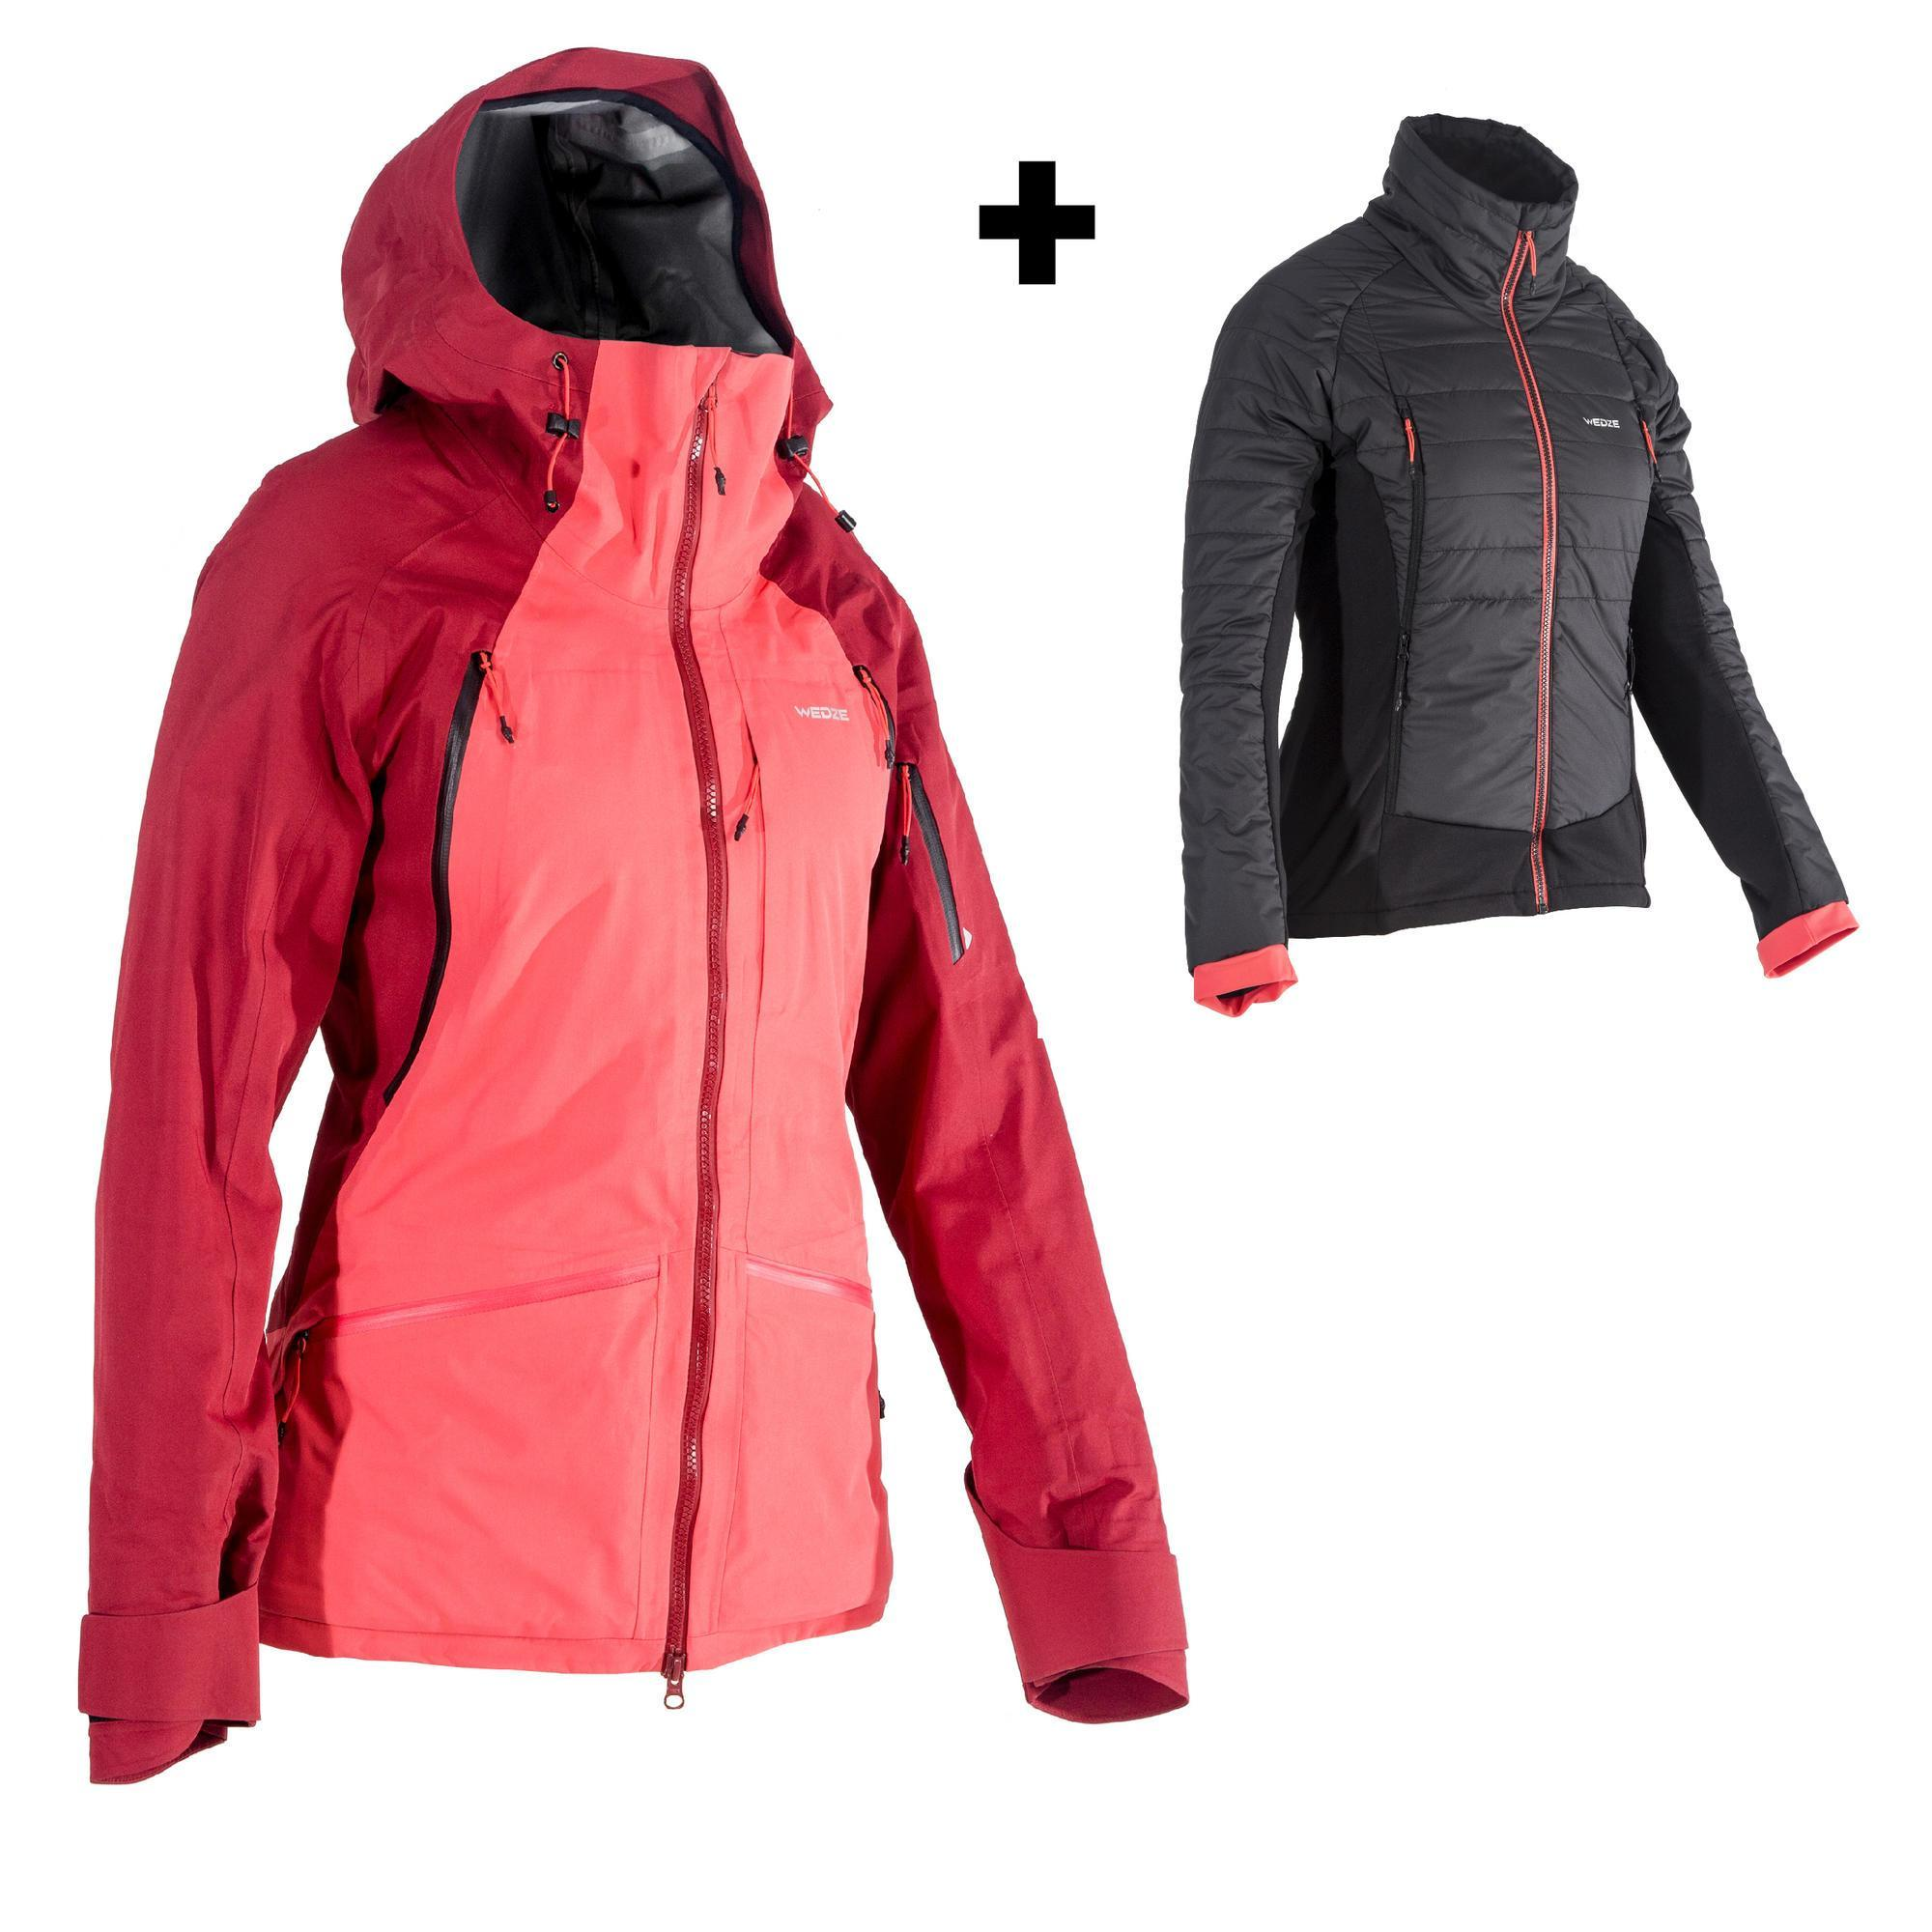 Damen Skijacke Freeride SFR 900 Damen bordeauxrot rosa | 03608449853811